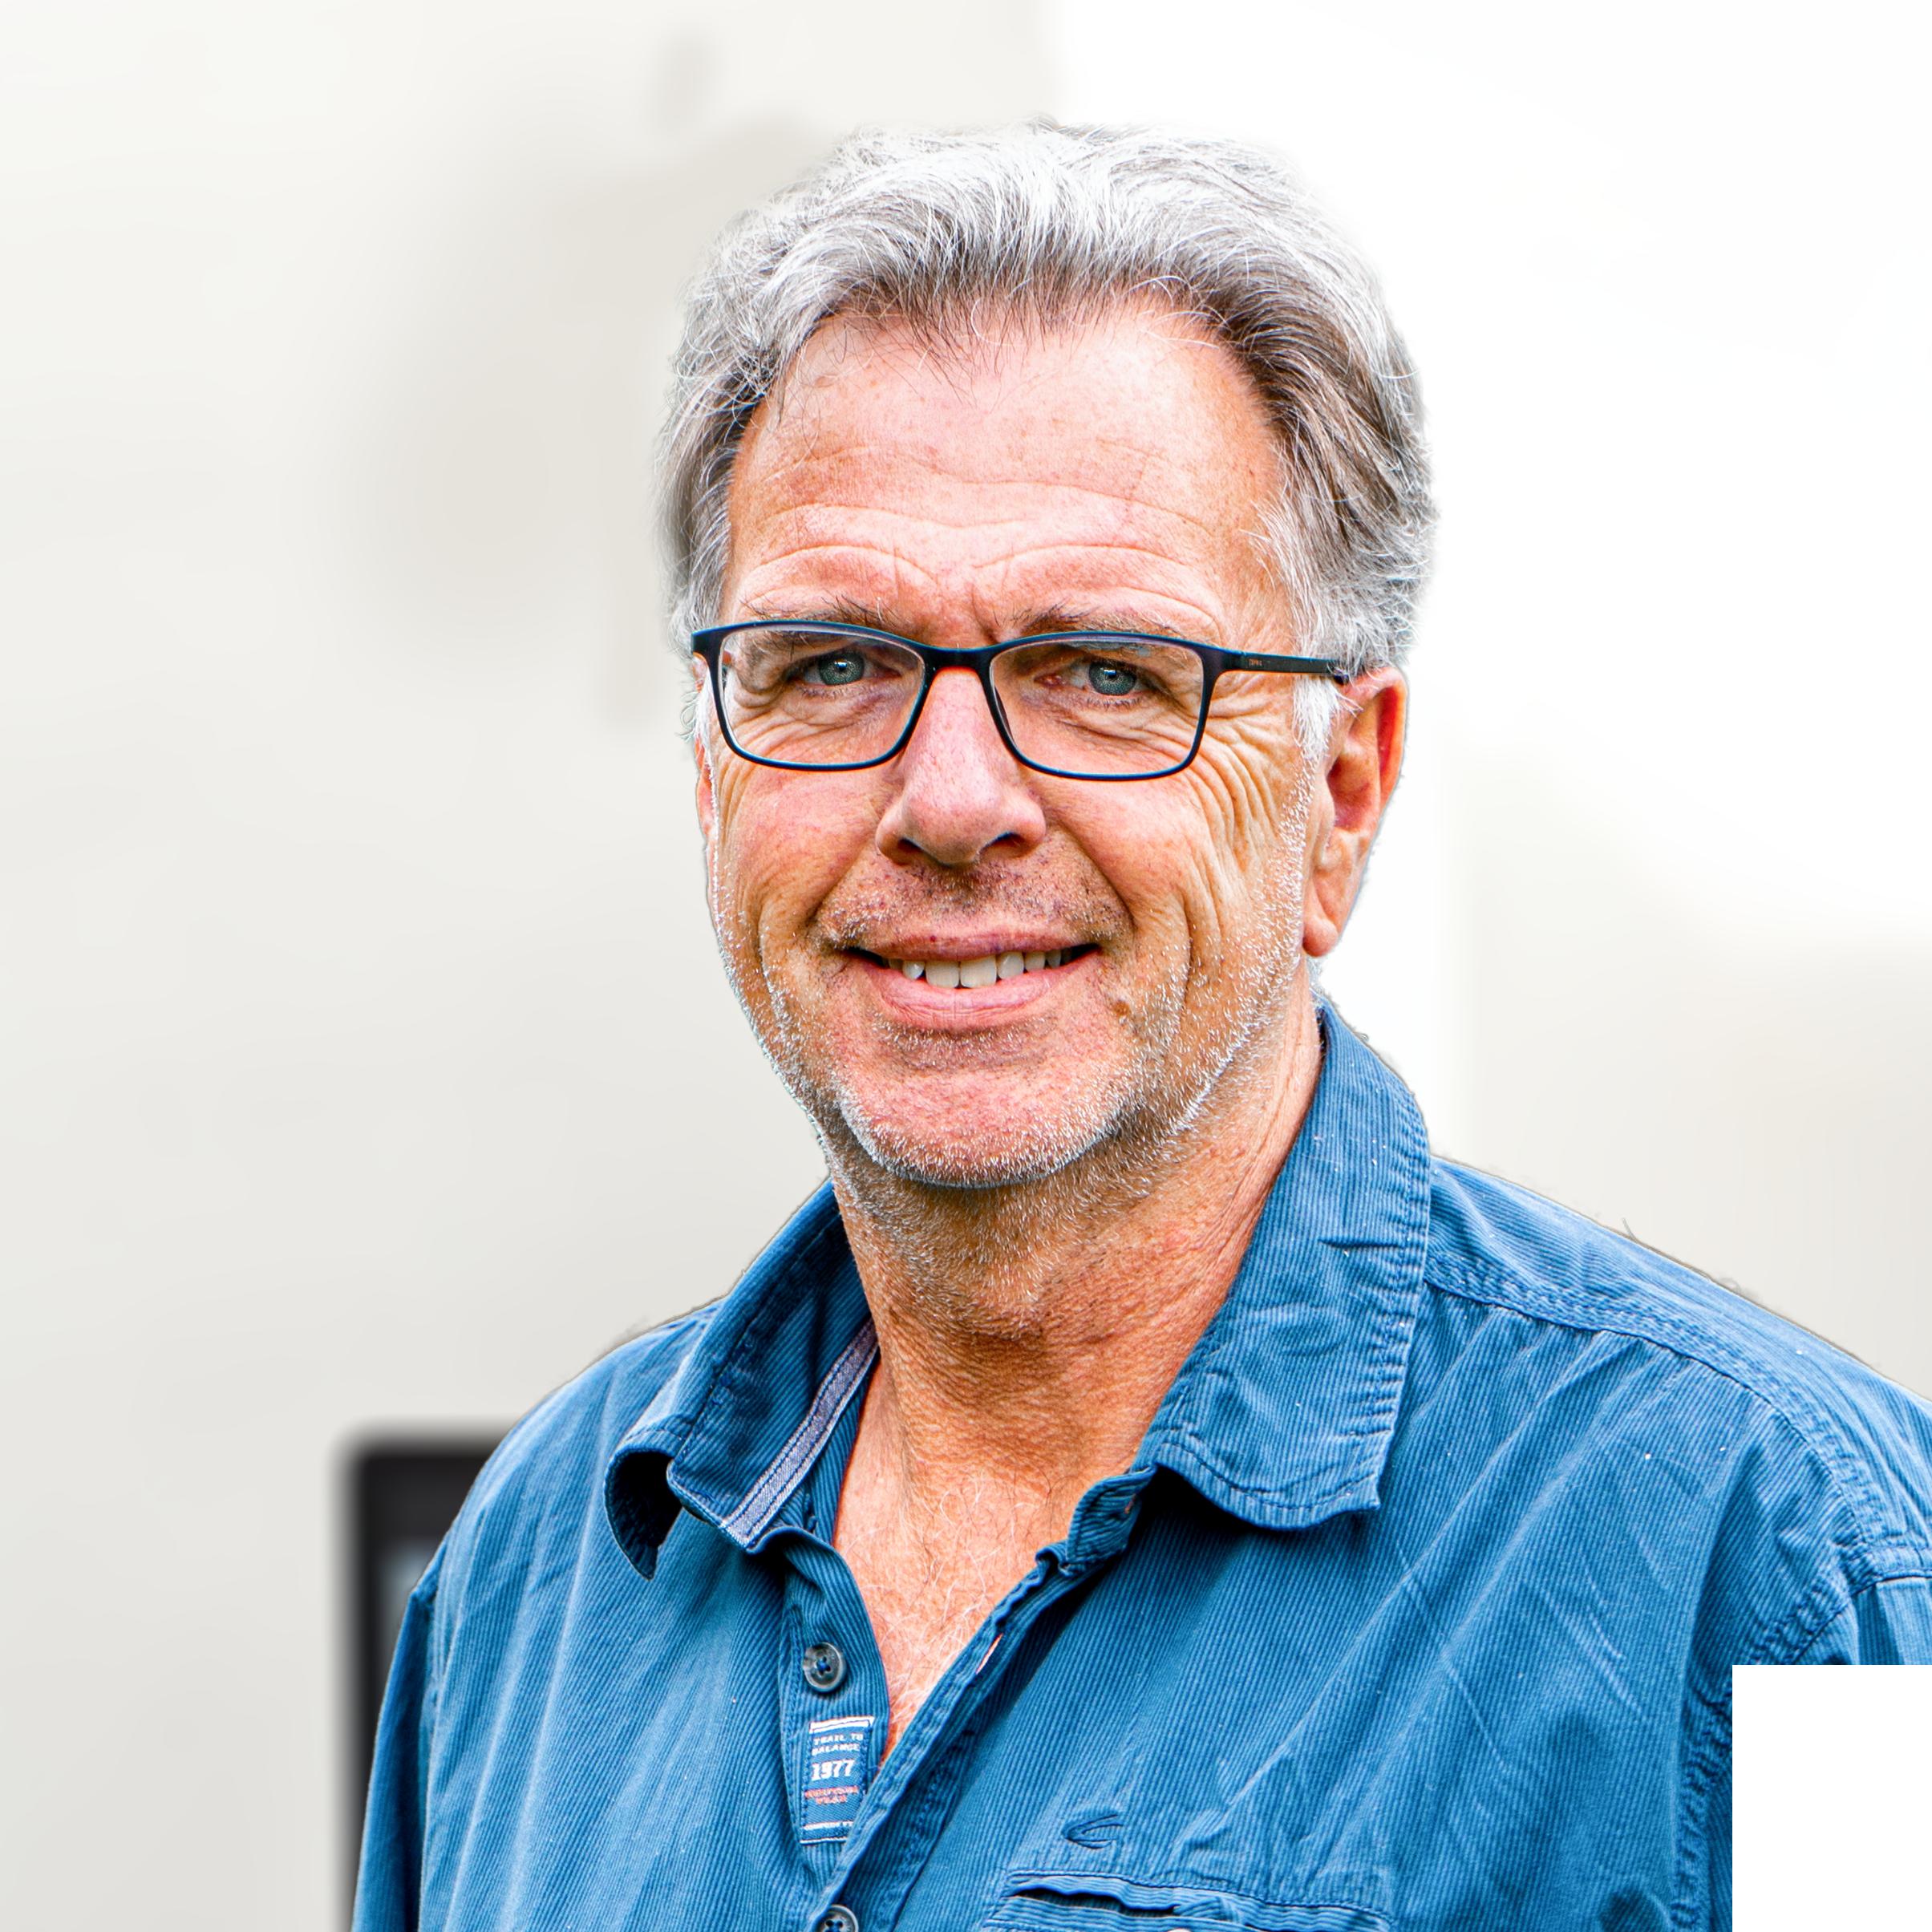 Klaus Roskoni Head of Sales and COO at Roskoni Media